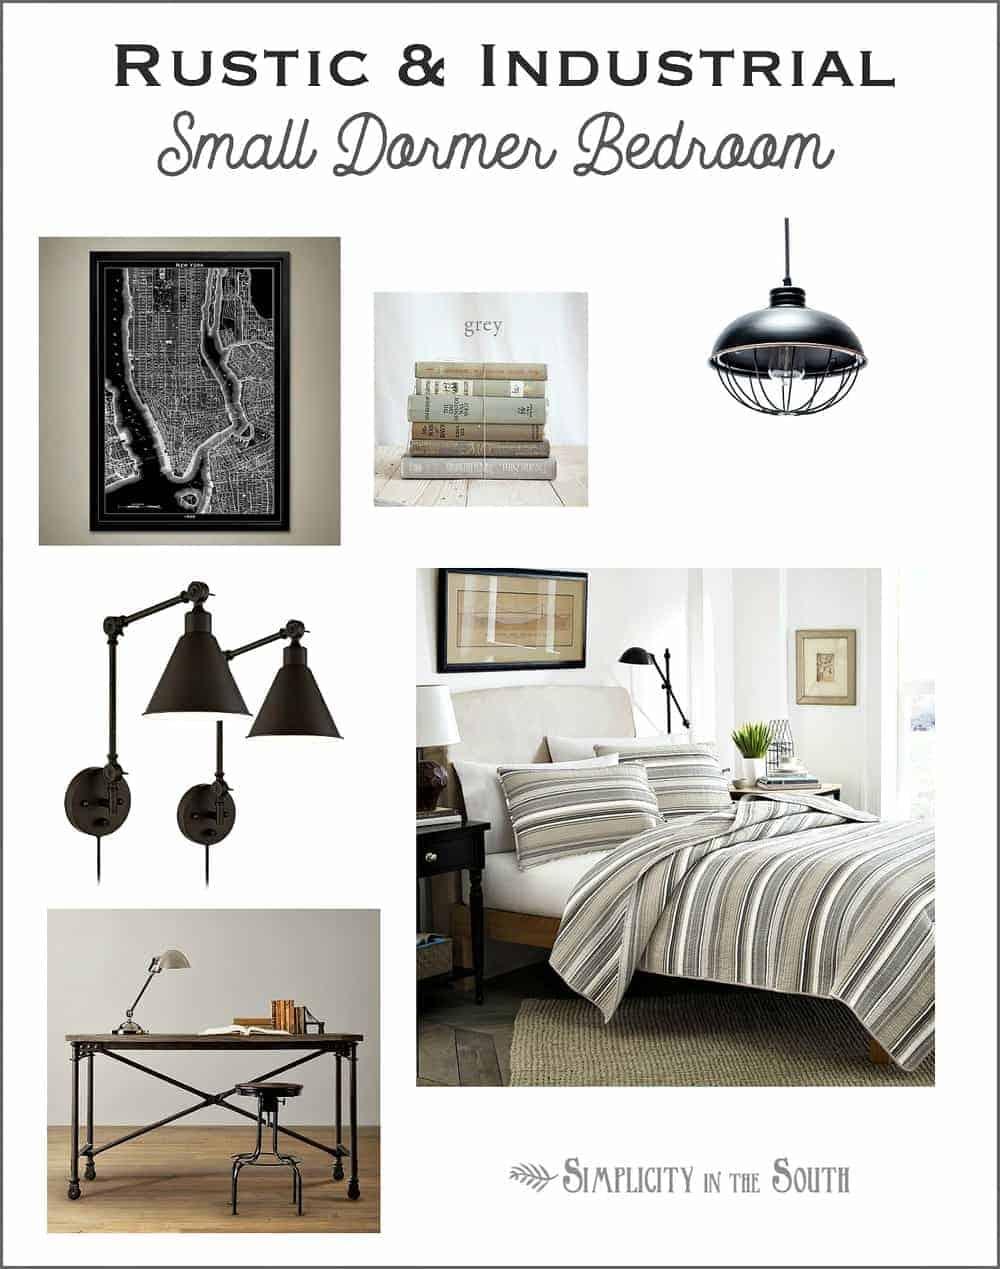 Design Plans for the Small Dormer Bedroom